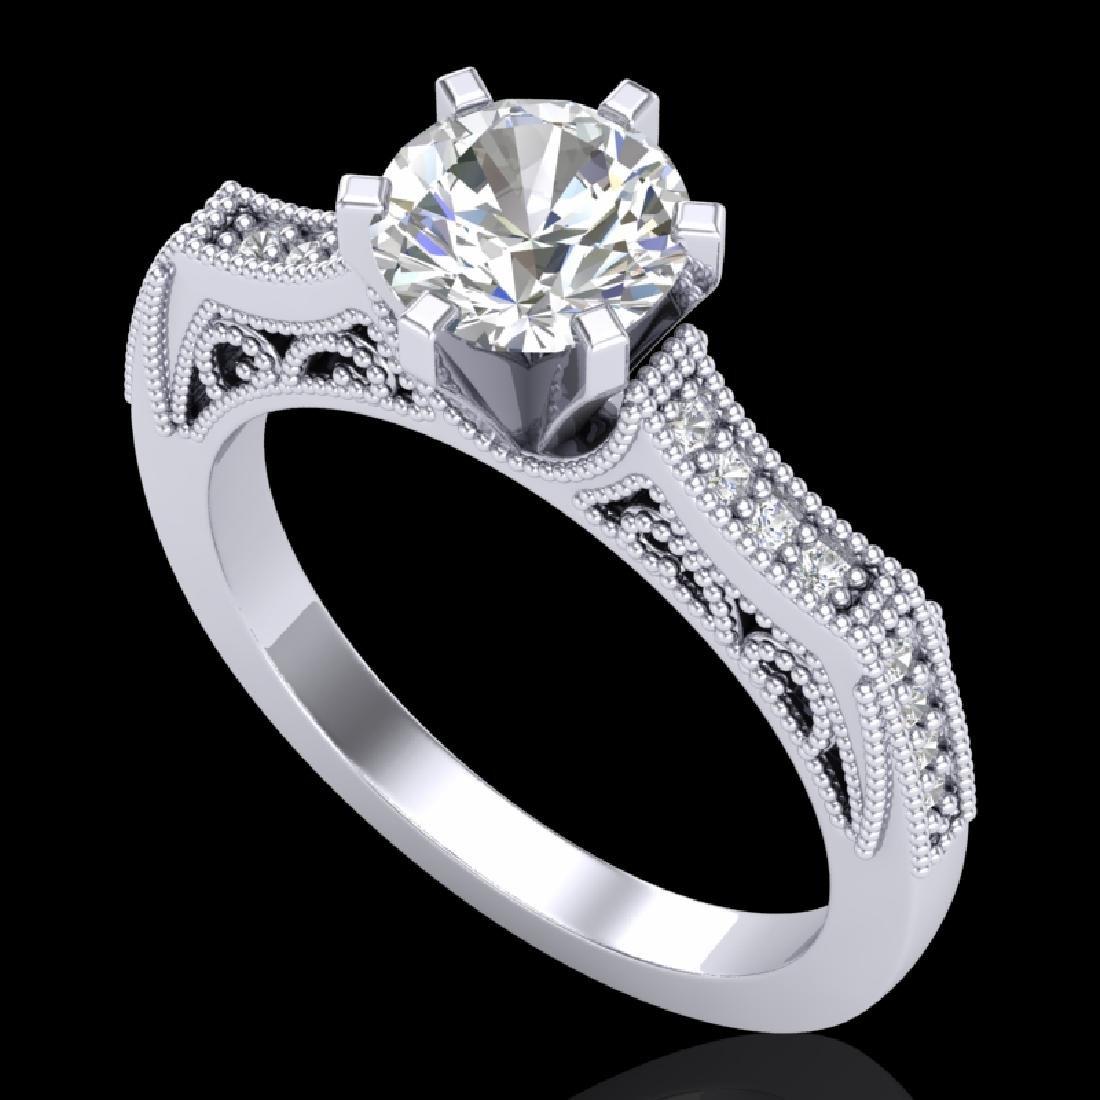 1.25 CTW VS/SI Diamond Solitaire Art Deco Ring 18K